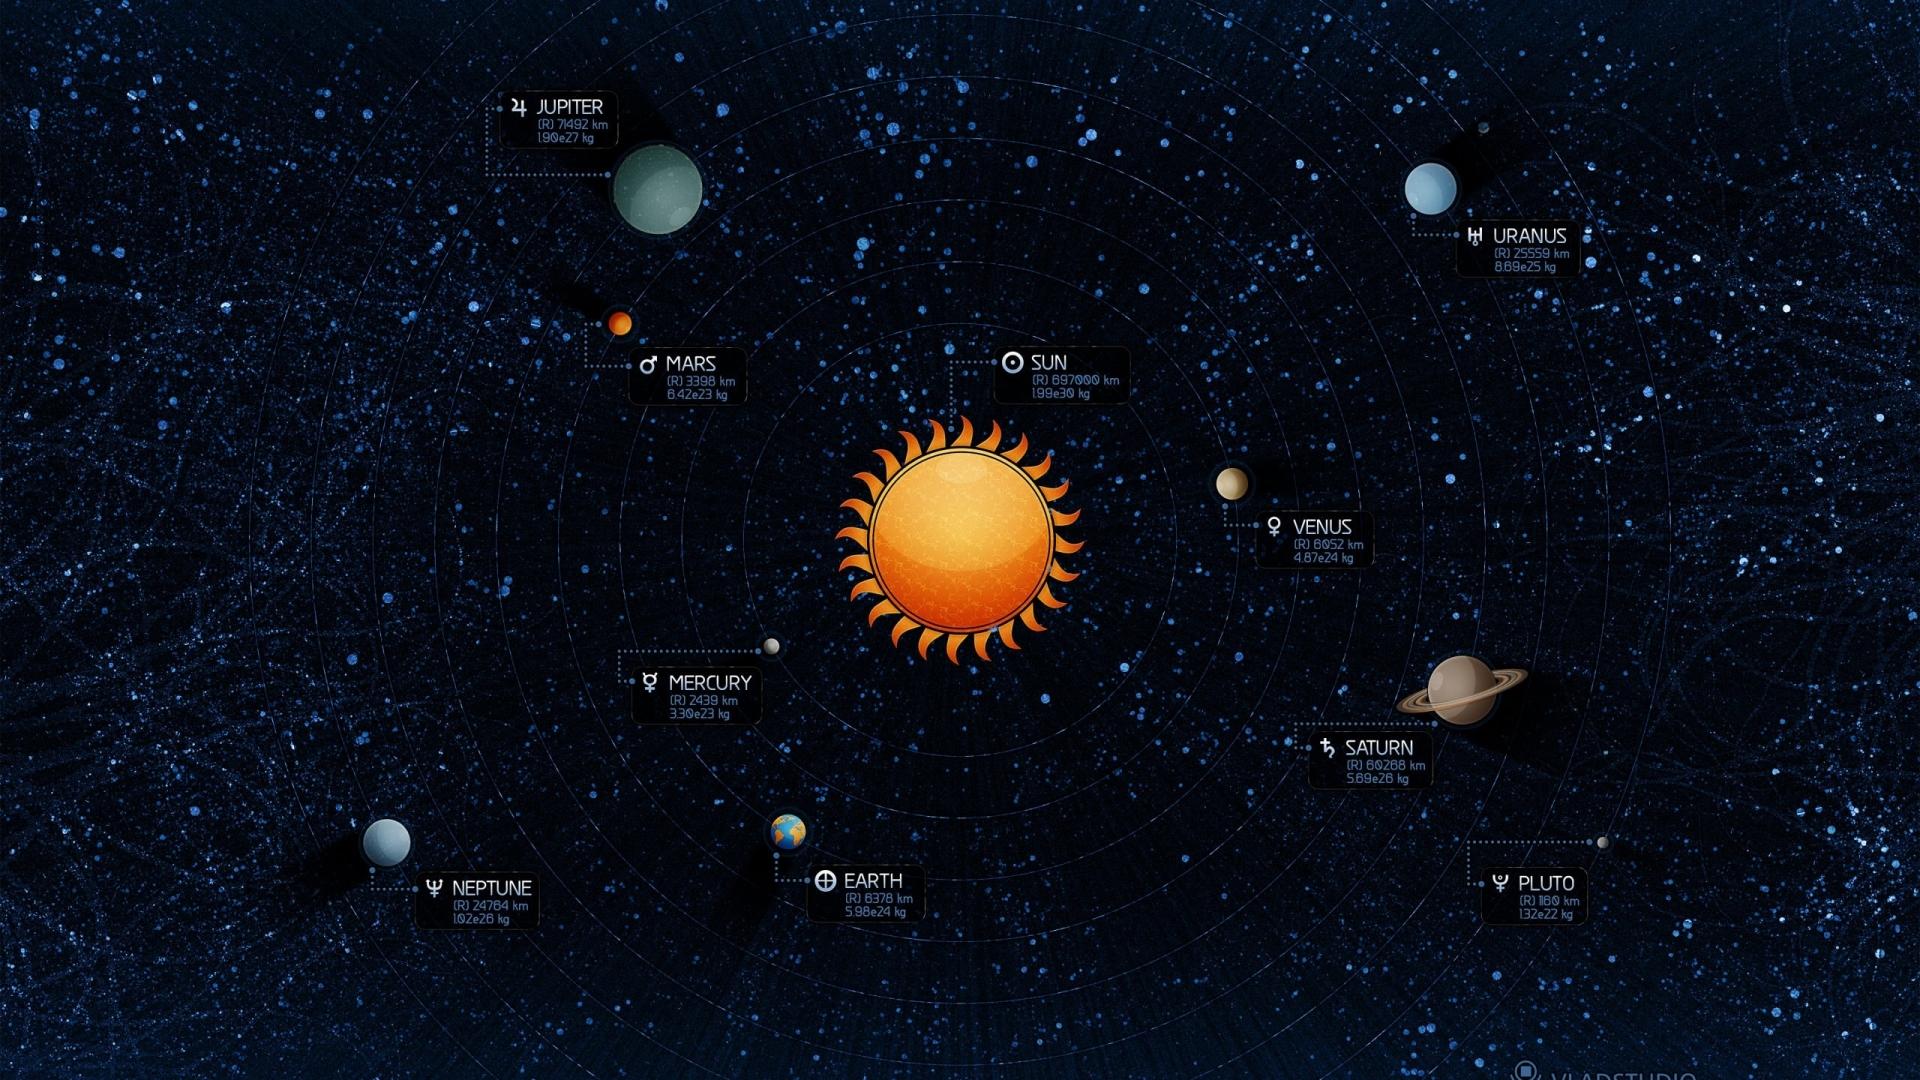 3D Planet and Sun 1920 x 1080 HDTV 1080p Wallpaper 1920x1080